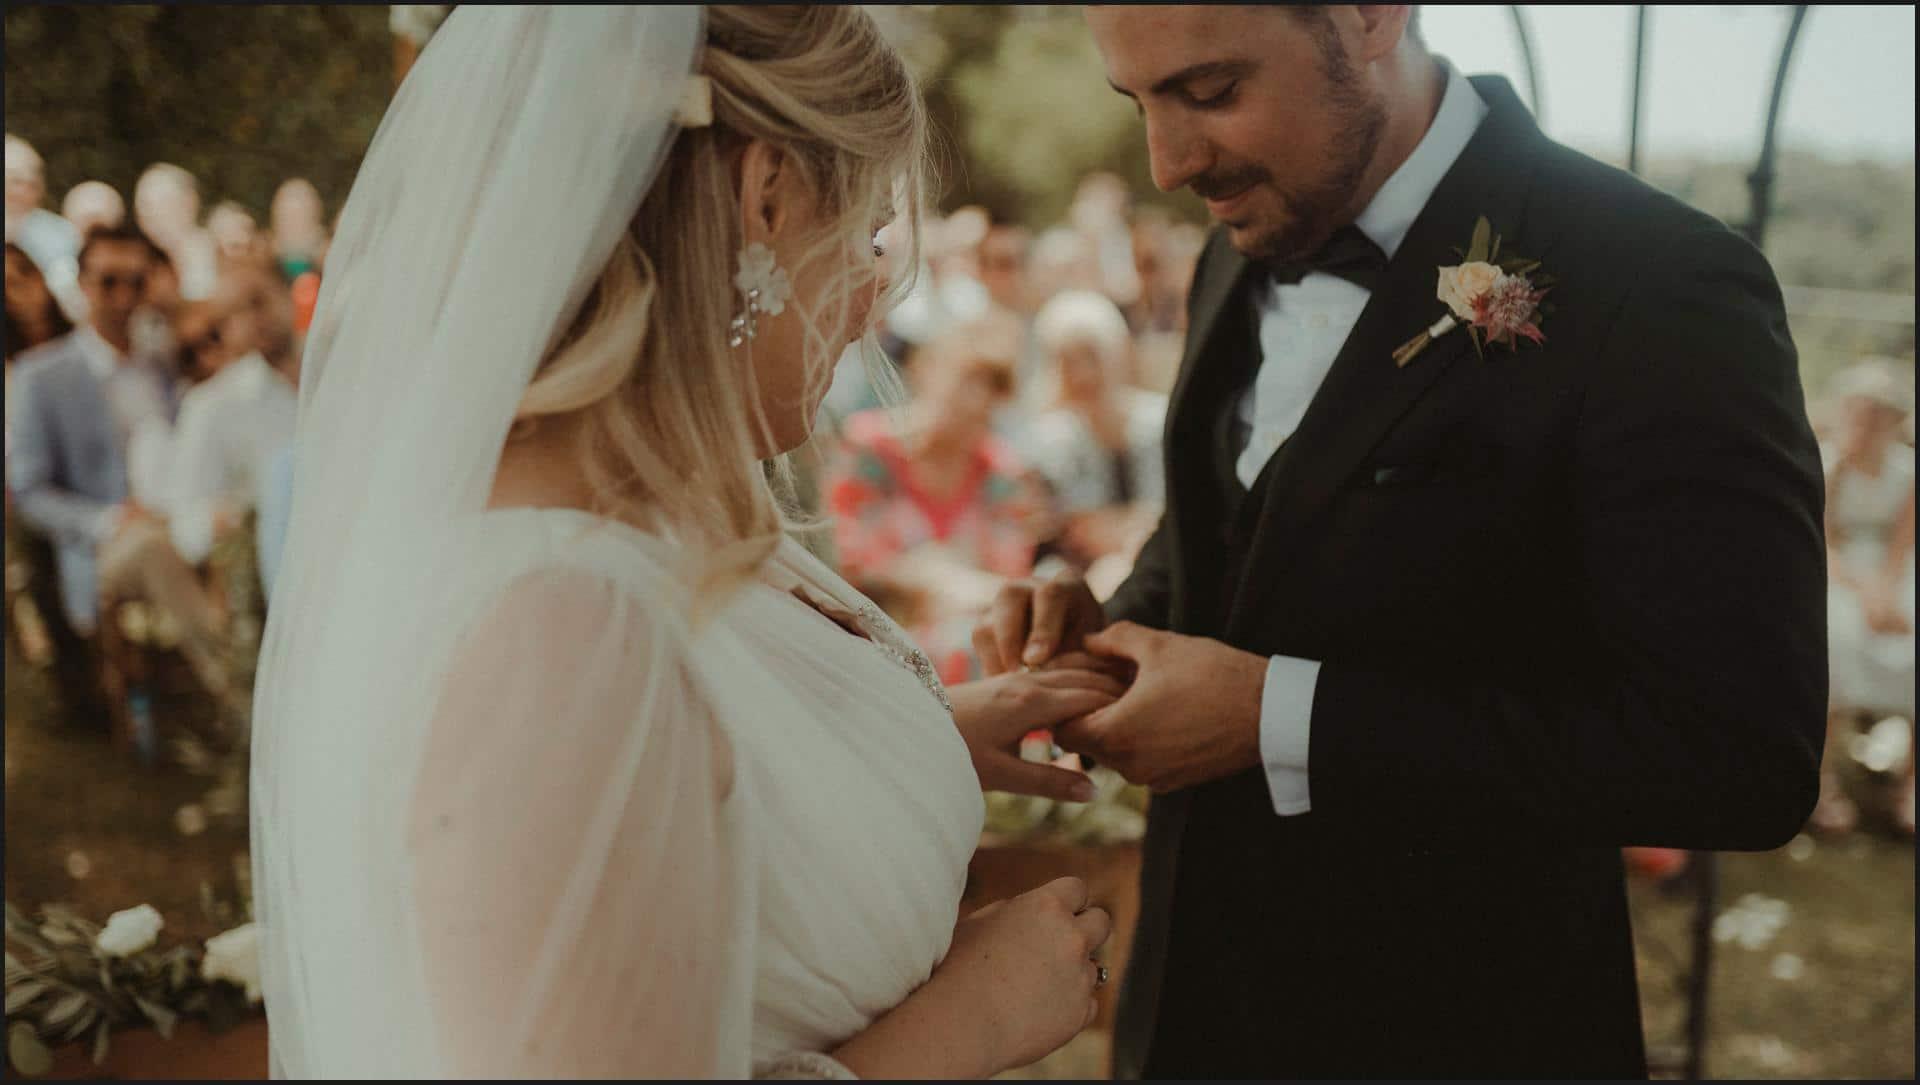 borgo di tragliata, wedding, rome, wedding in rome, bride, groom, wedding band, exchanging of the rings